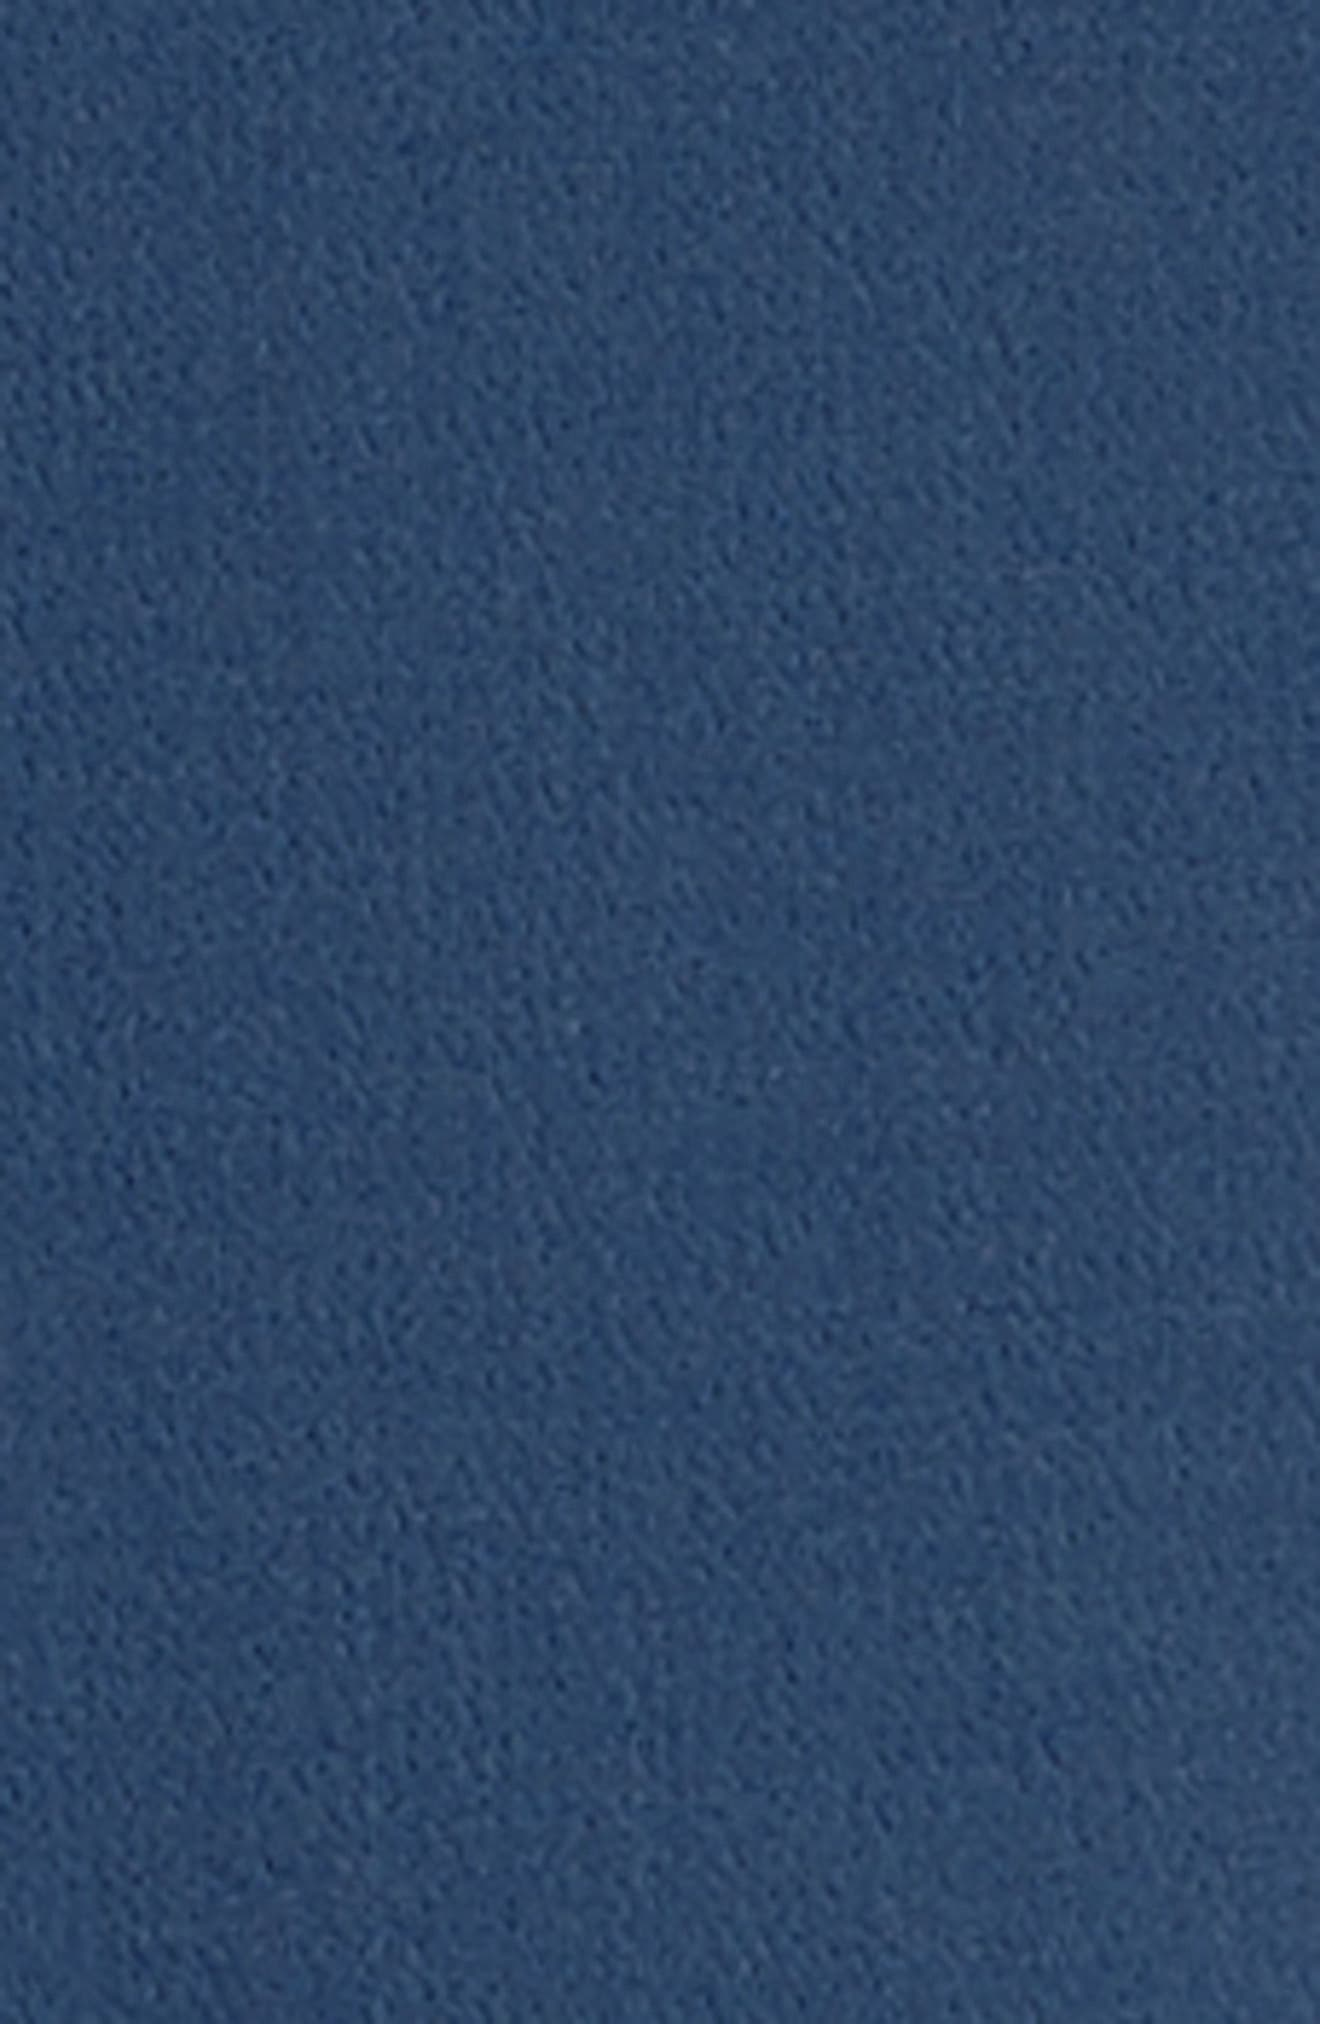 Double Face Wool Crepe Sheath Dress,                             Alternate thumbnail 5, color,                             Atlantic